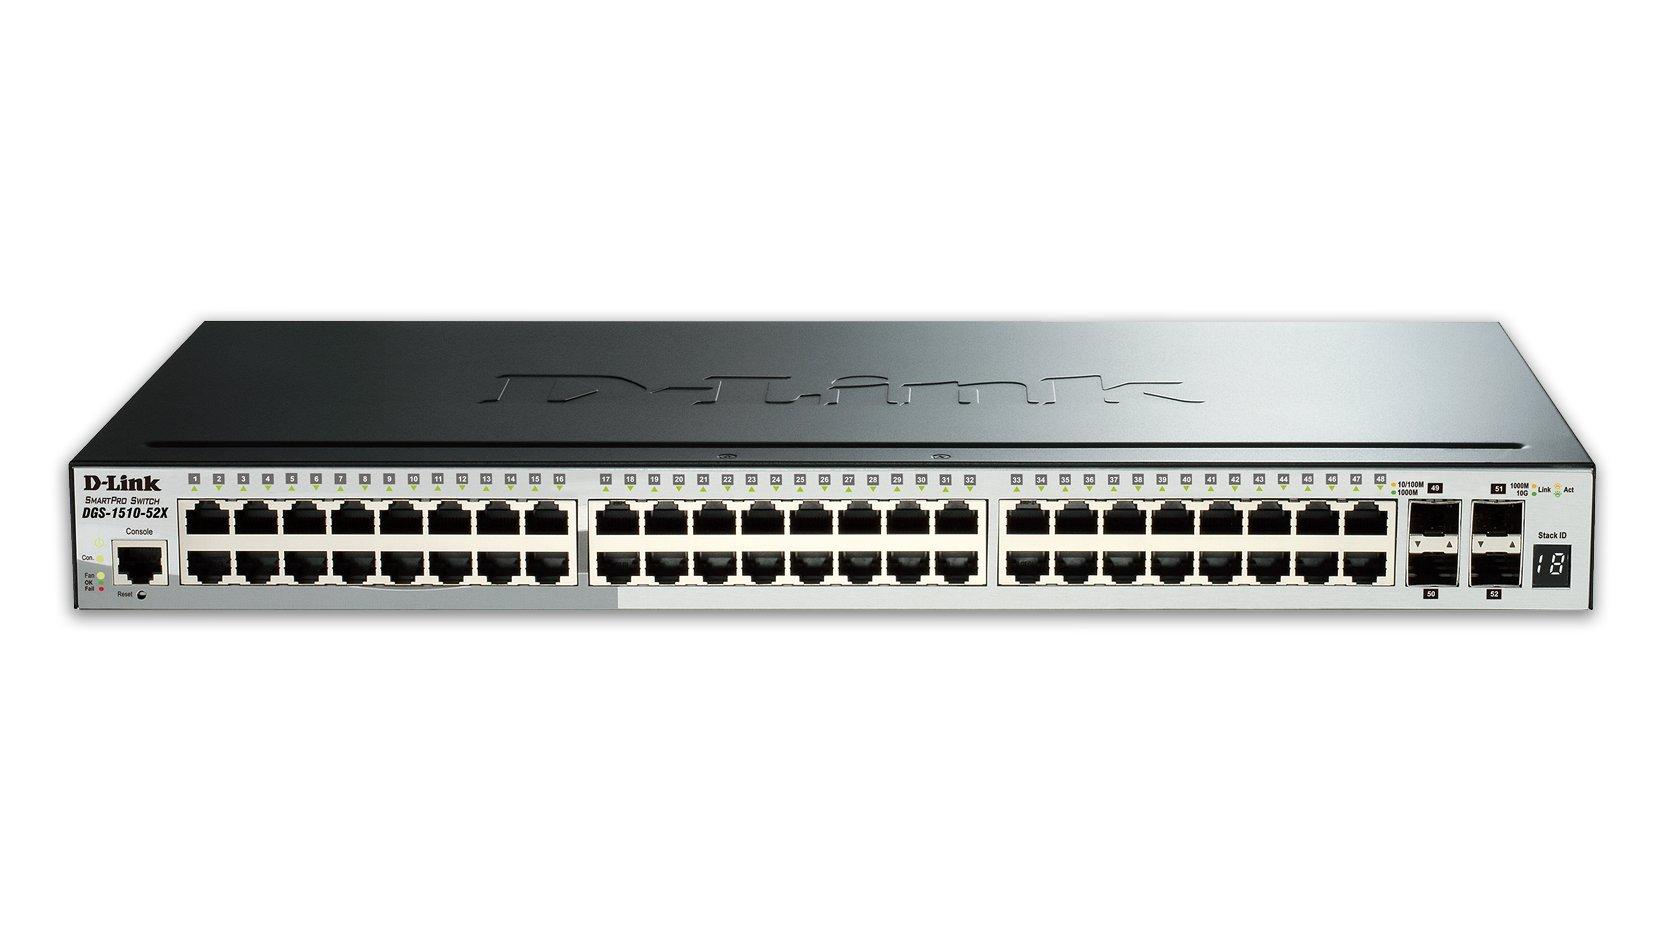 D-Link Systems 52-Port Gigabit SmartPro Stackable Switch & 4 10GbE SFP+ Ports (DGS-1510-52X) by D-Link